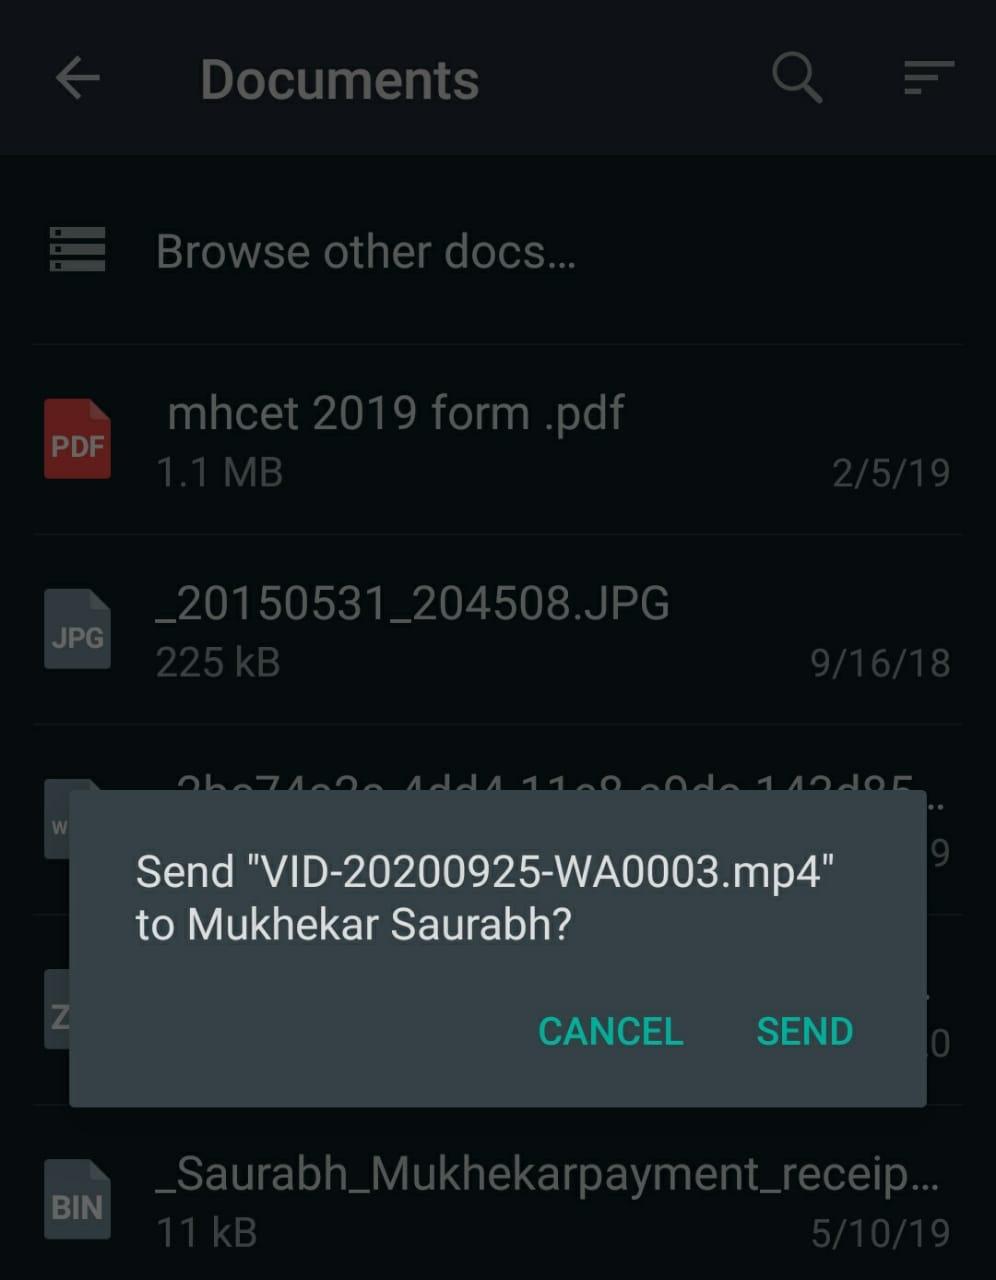 Sending Large Video Whataspp-2